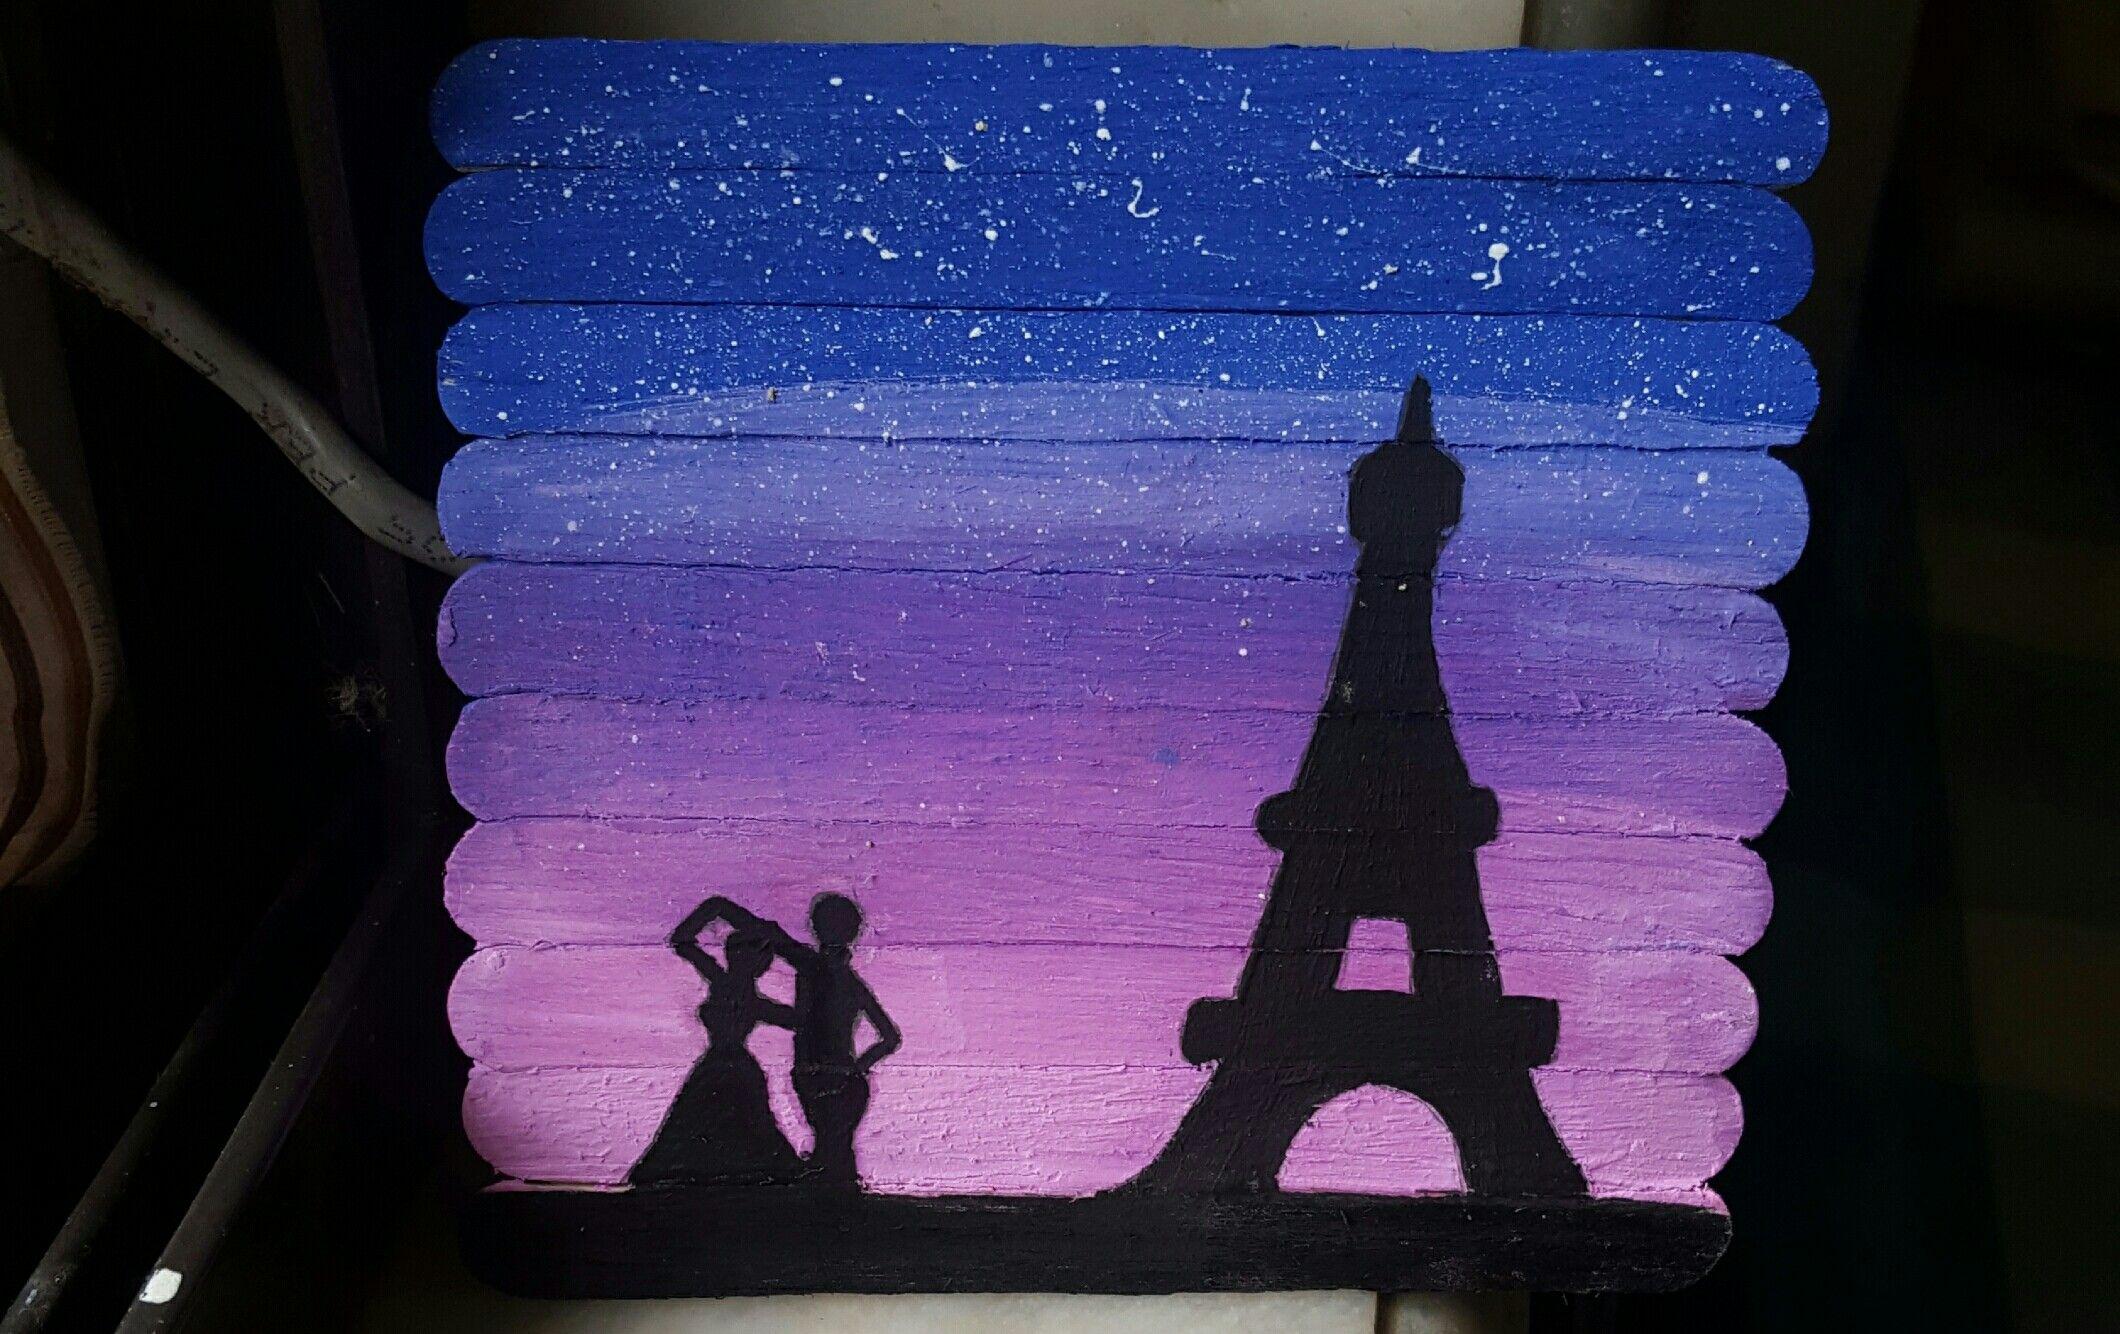 A beautiful night in the city of love | DIY | Pinterest | Dibujo ...